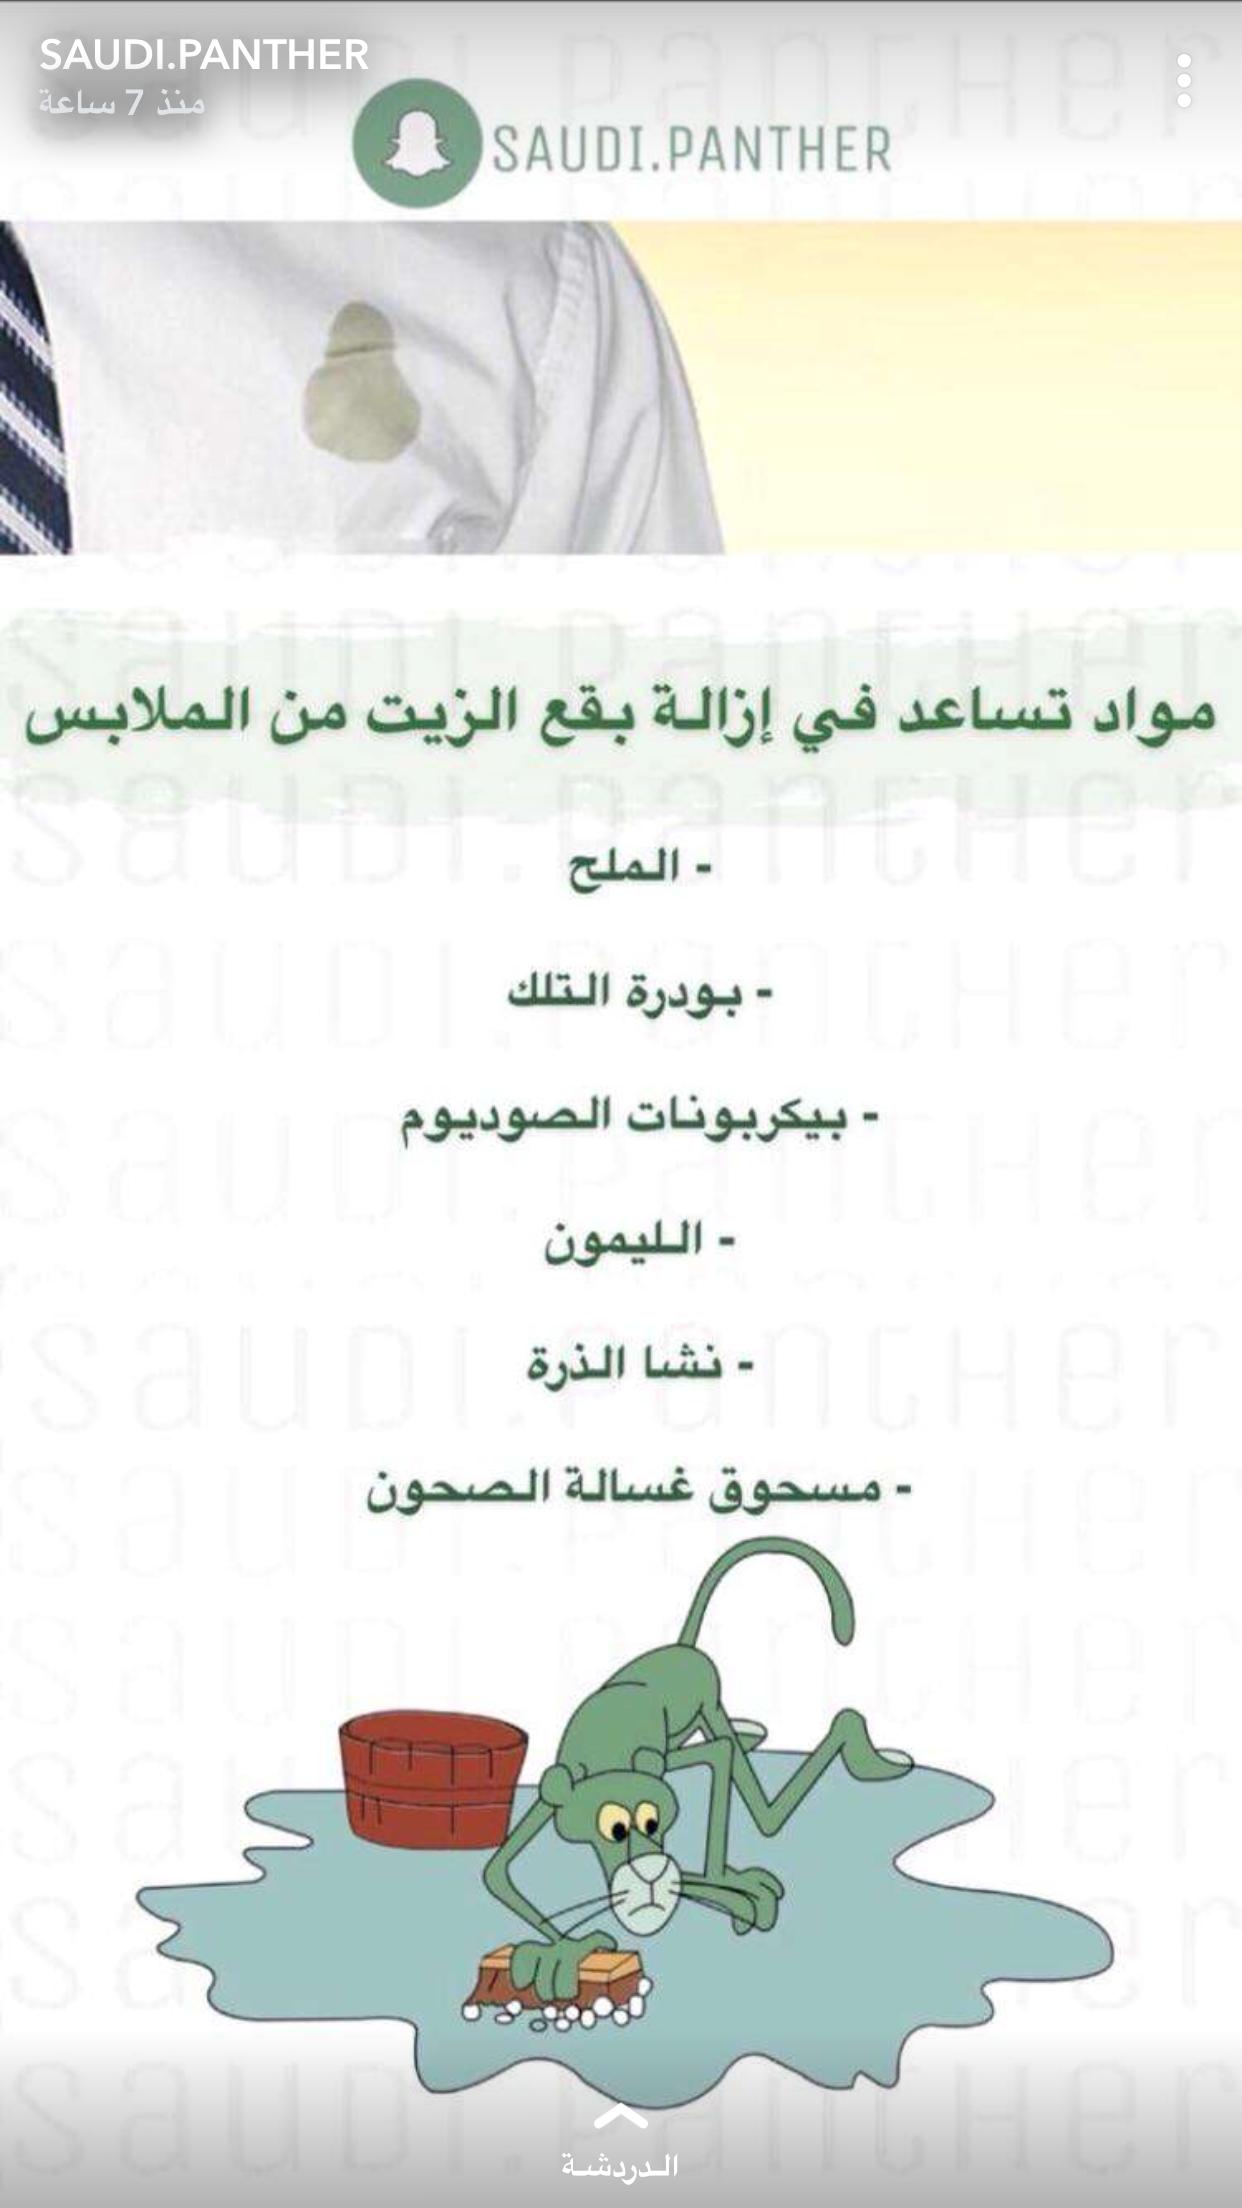 Pin By Arwa On ازاله البقع House Cleaning Tips House Cleaning Checklist Clean House